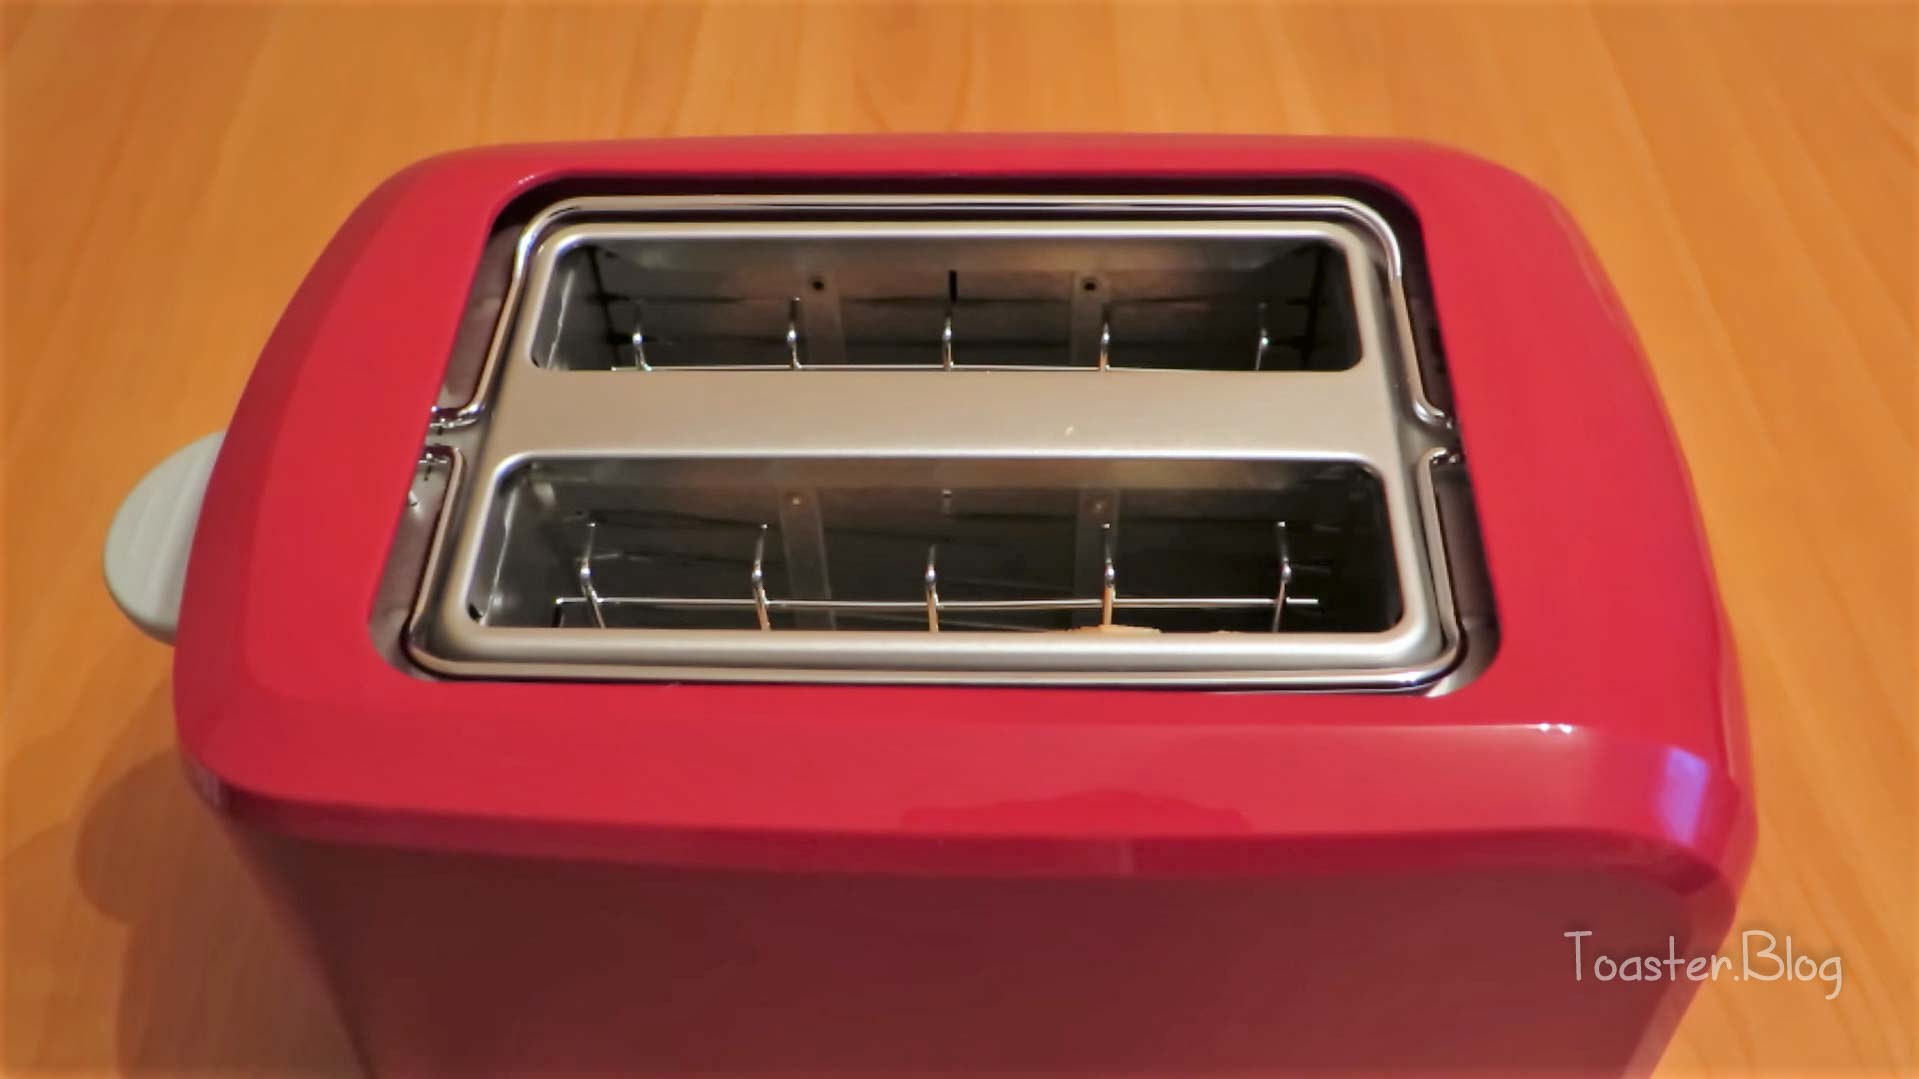 Best side toaster